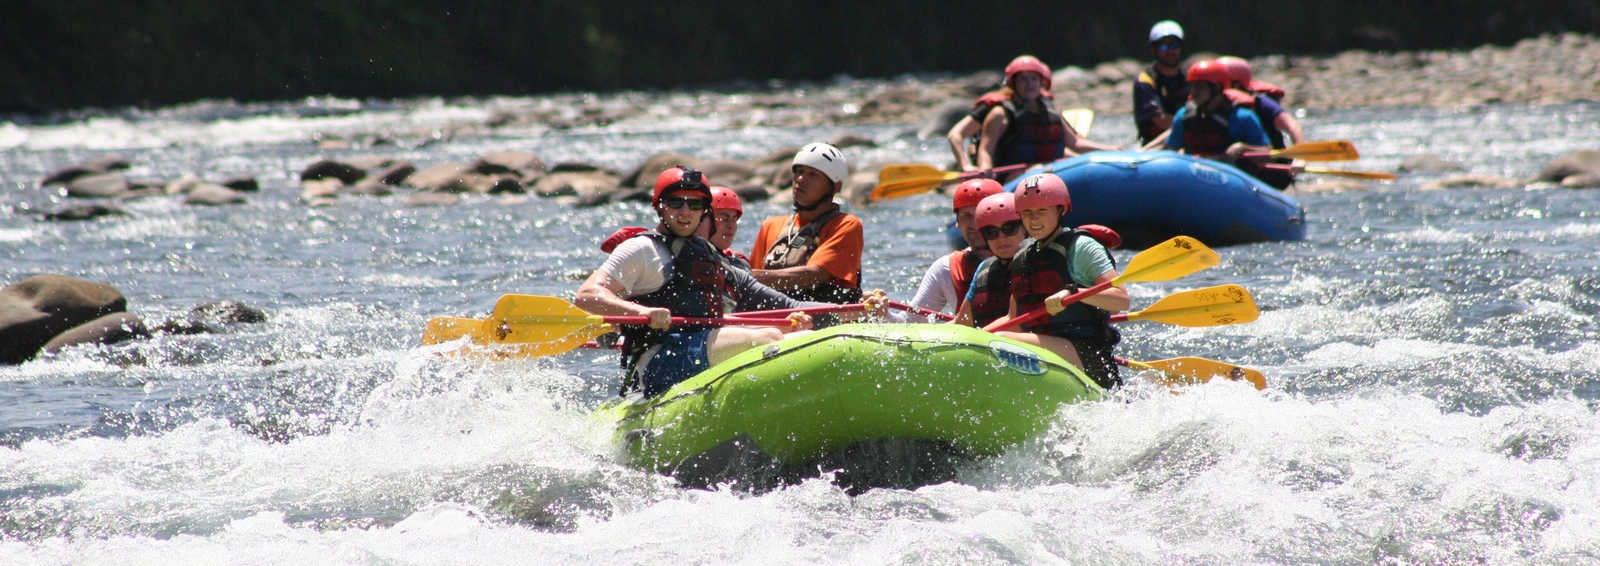 Sarapiqui river rafting, Costa Rica